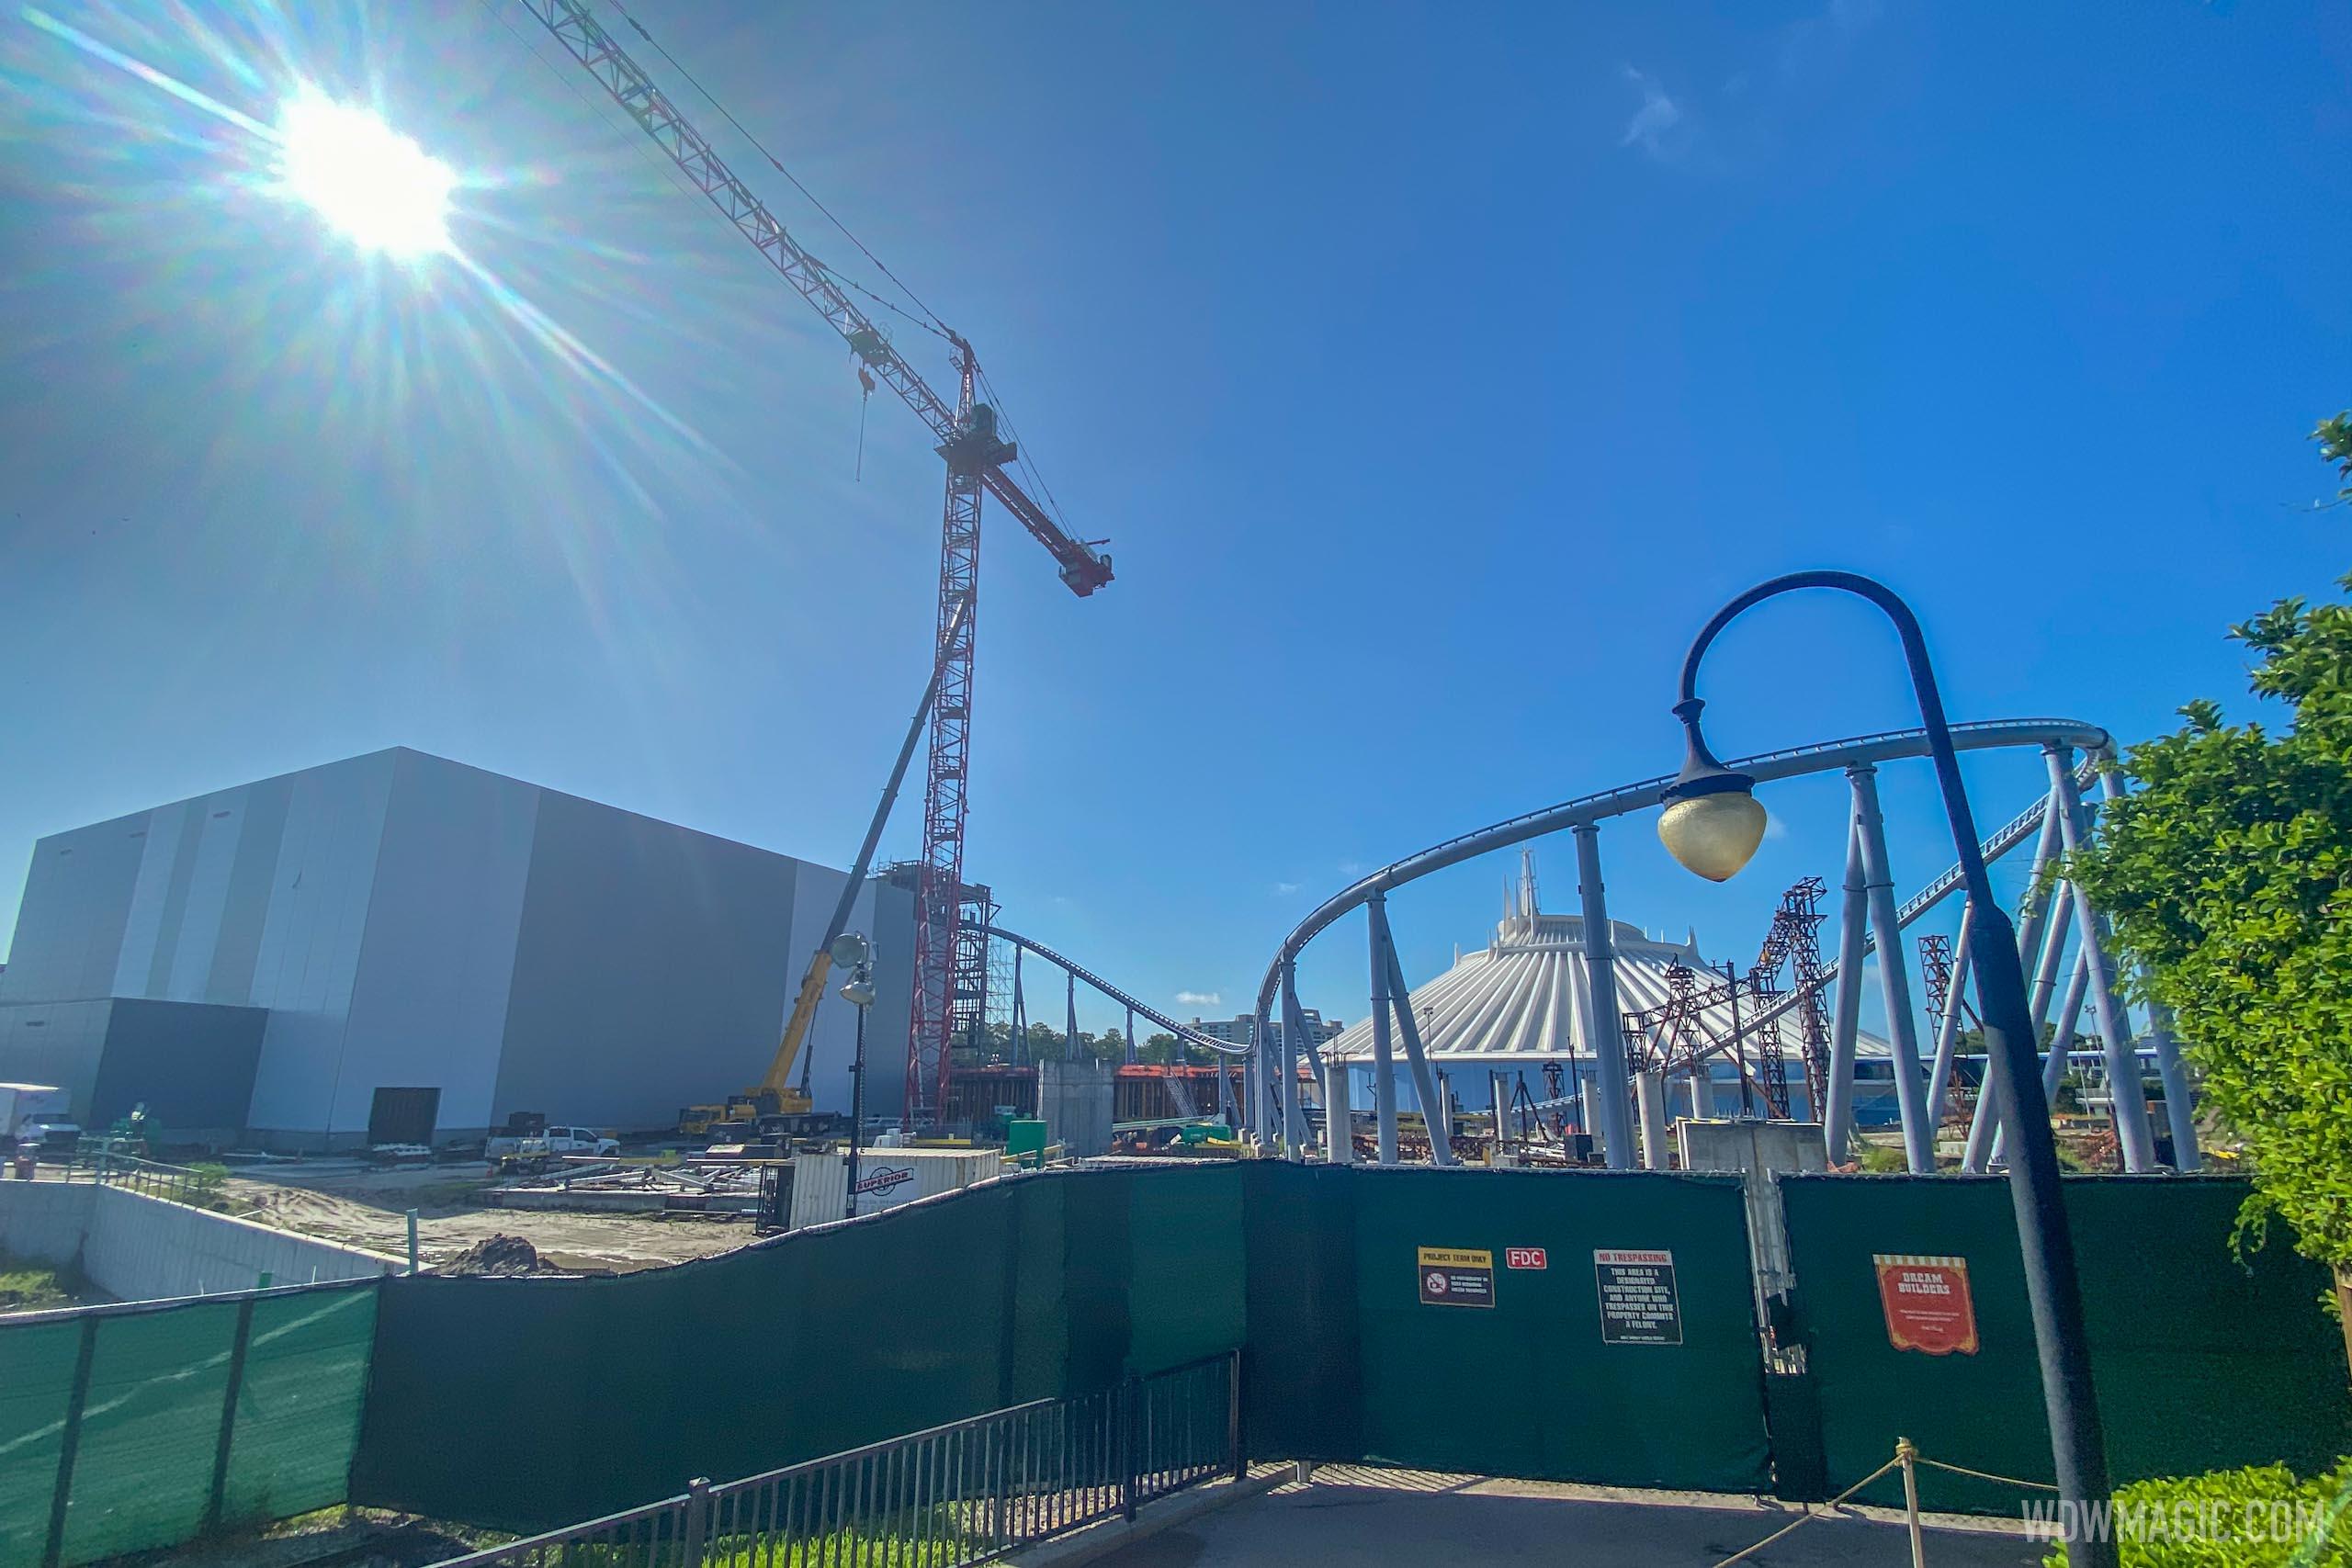 TRON Lightcycle Run construction - July 7 2020